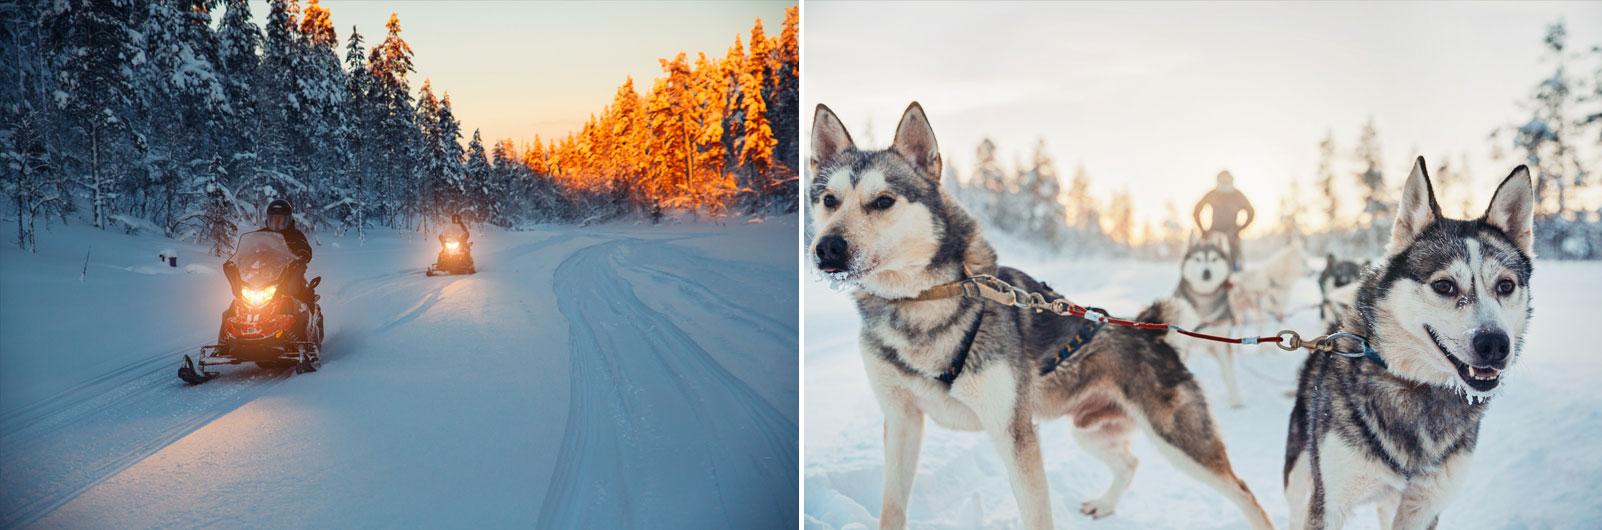 Aurora Boreale finlandia Kakslauttanen Snowmobile Husky Safari